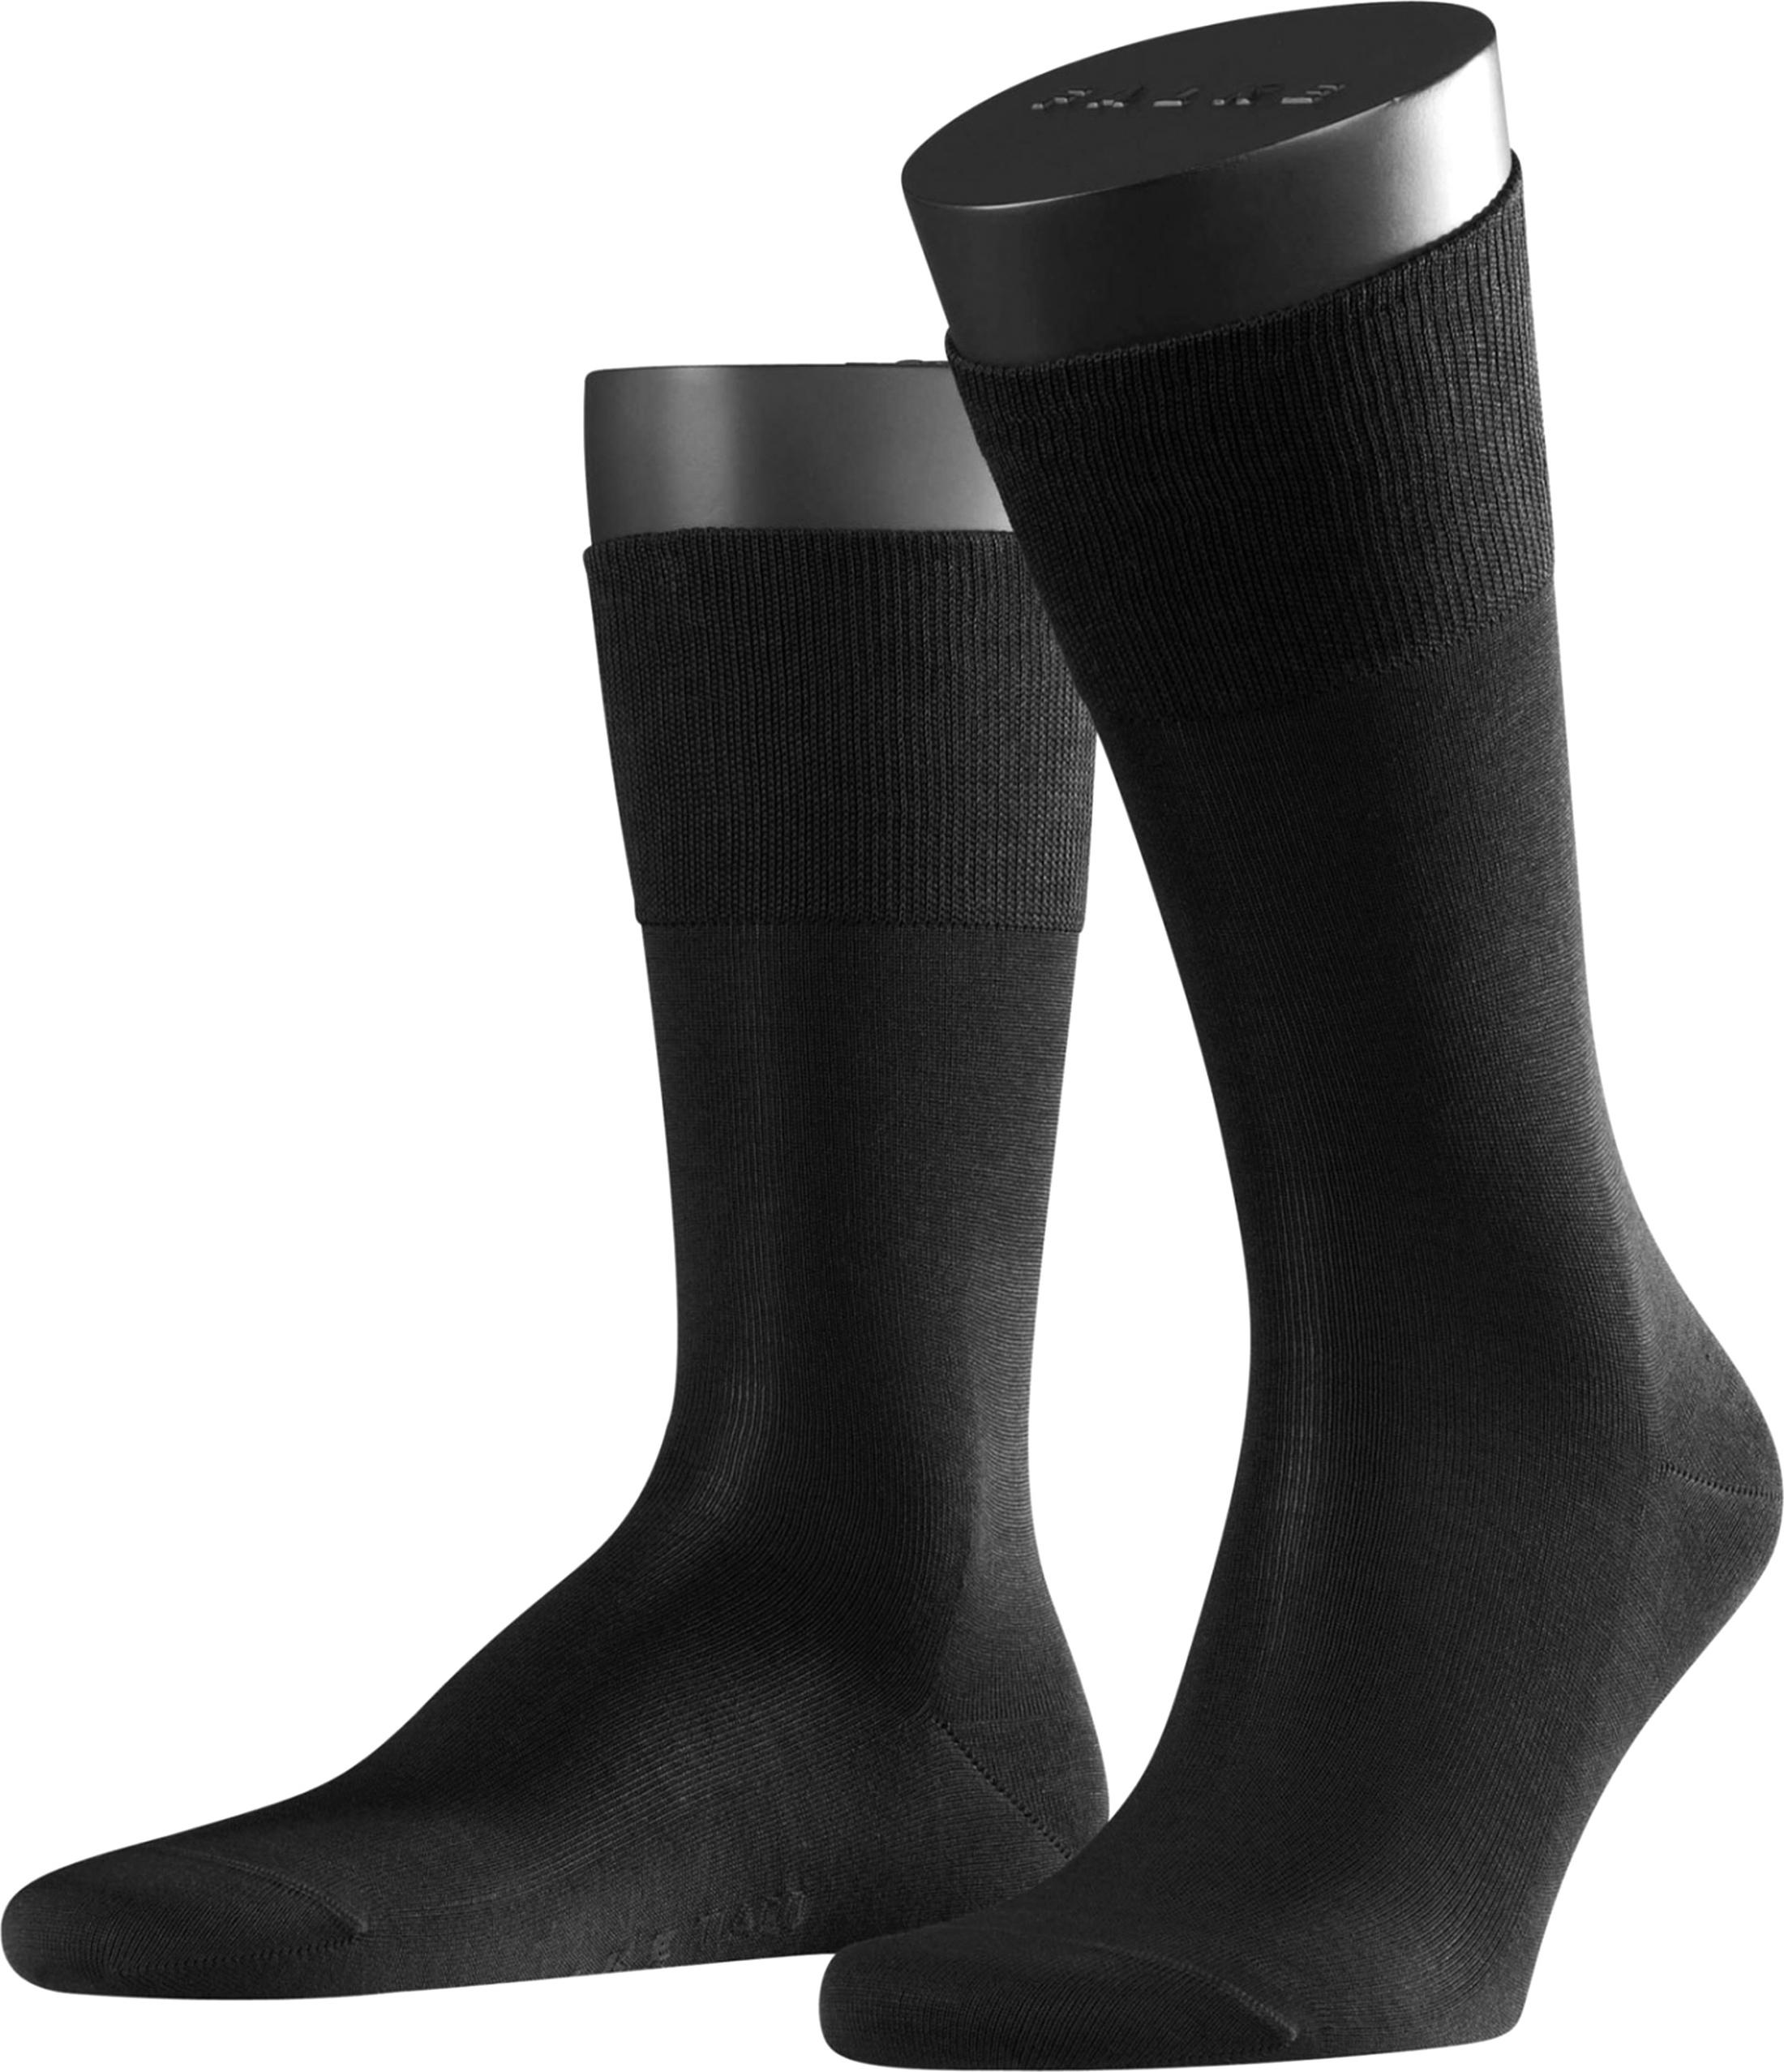 Falke Airport Socks Black 3000 foto 0